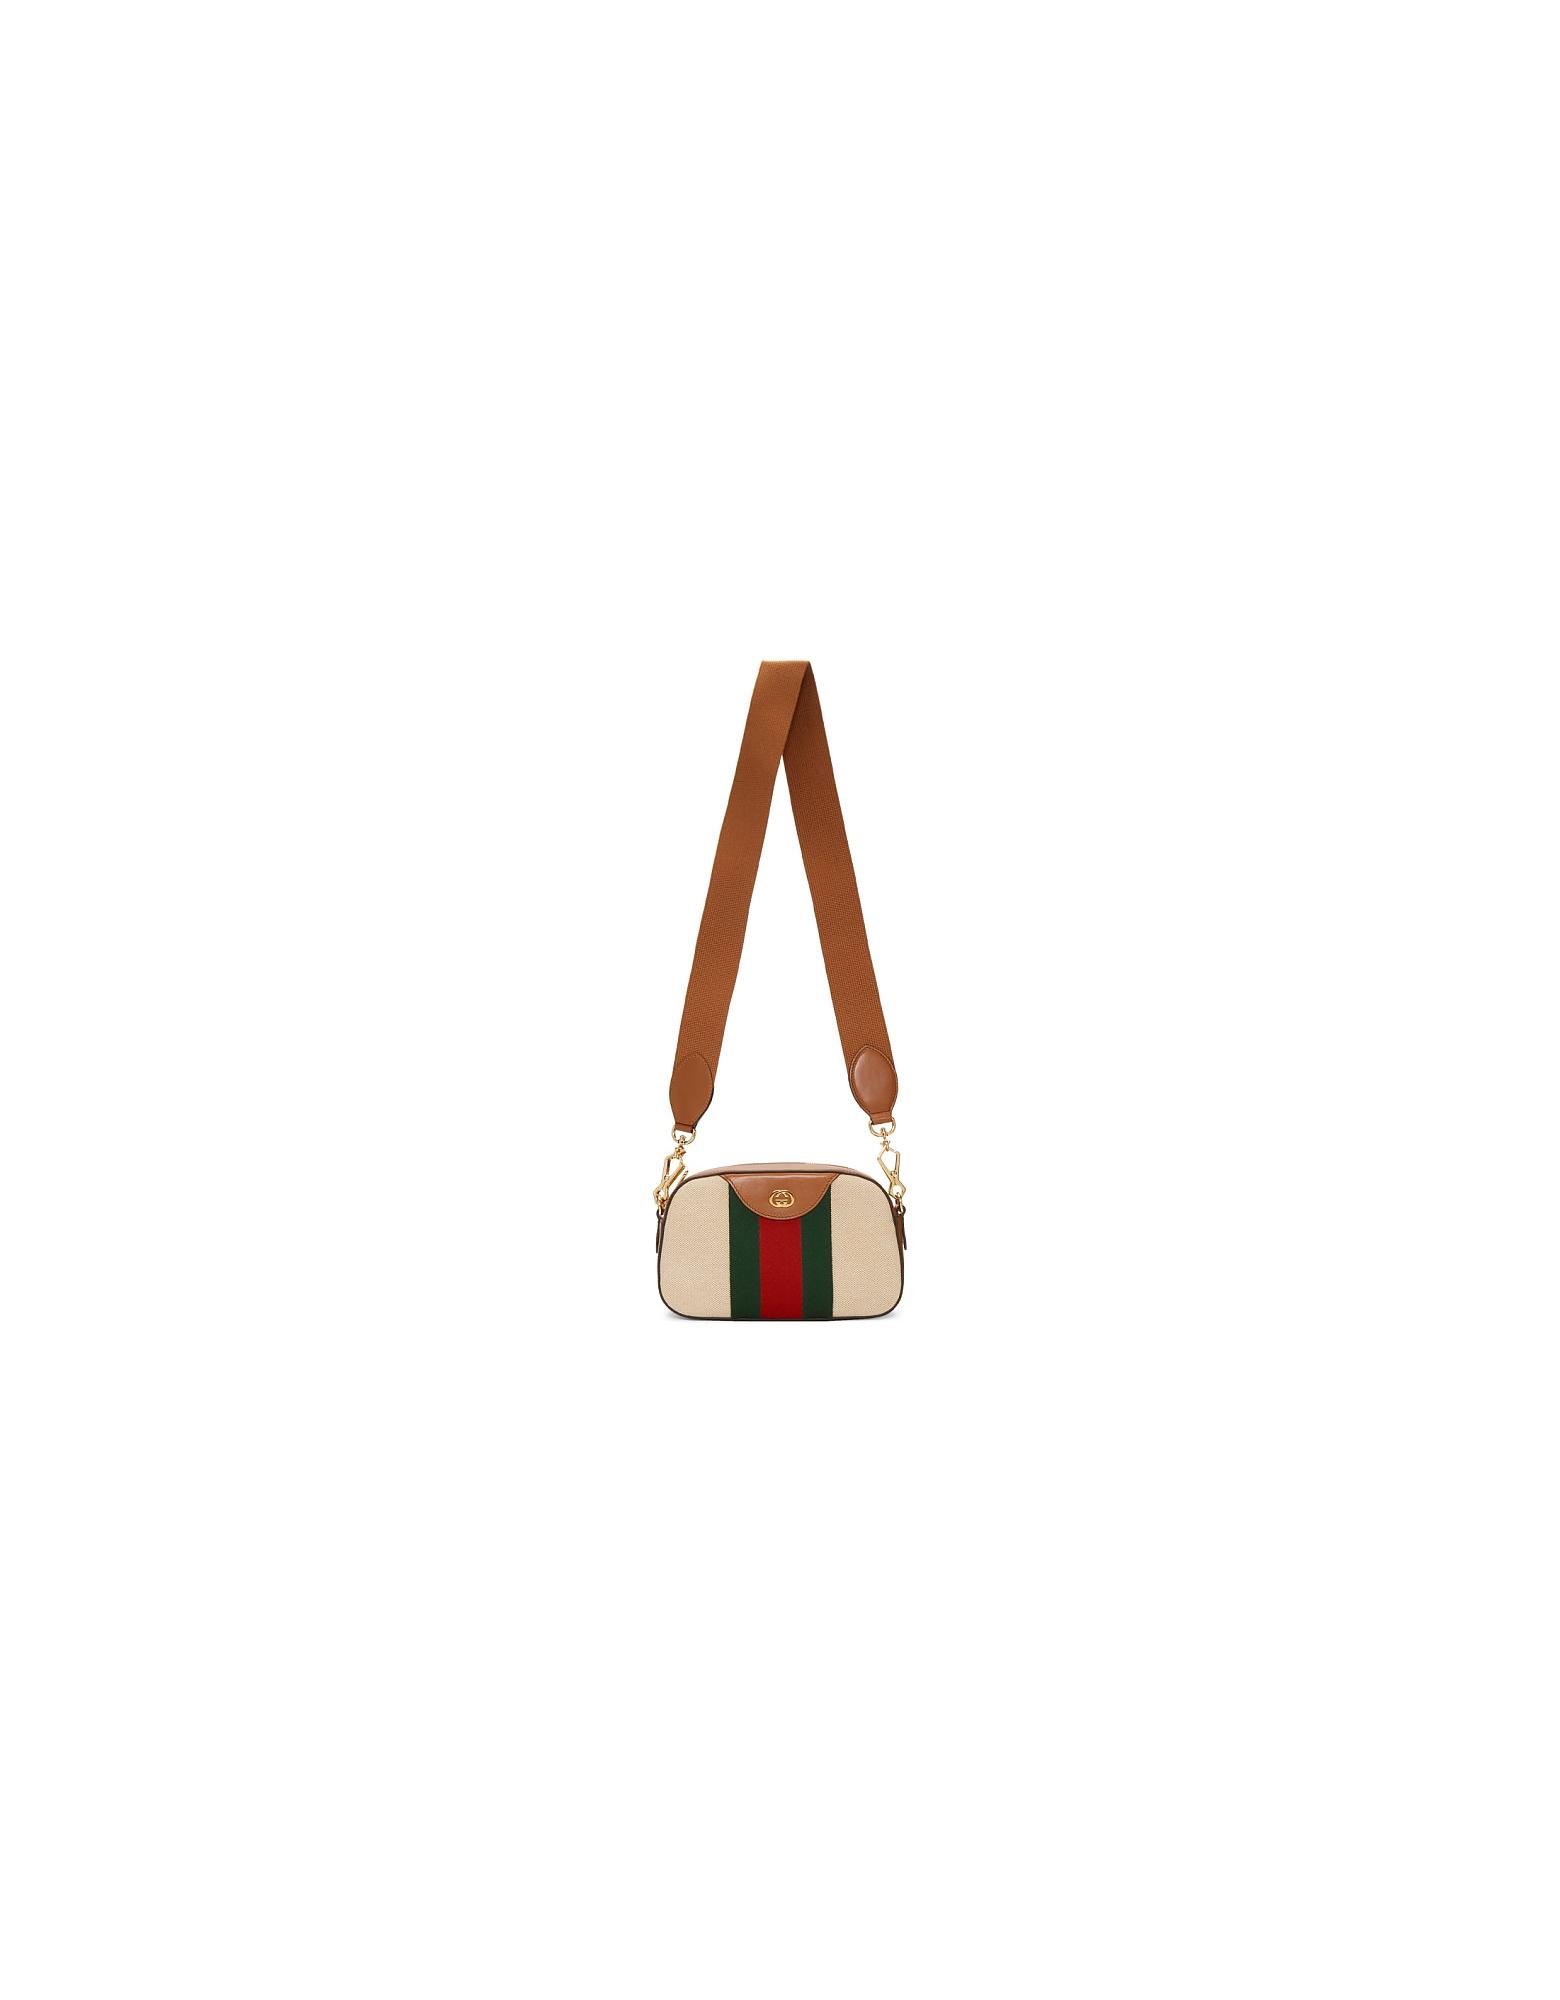 Gucci Designer Handbags, Beige GG Vintage Canvas Bag